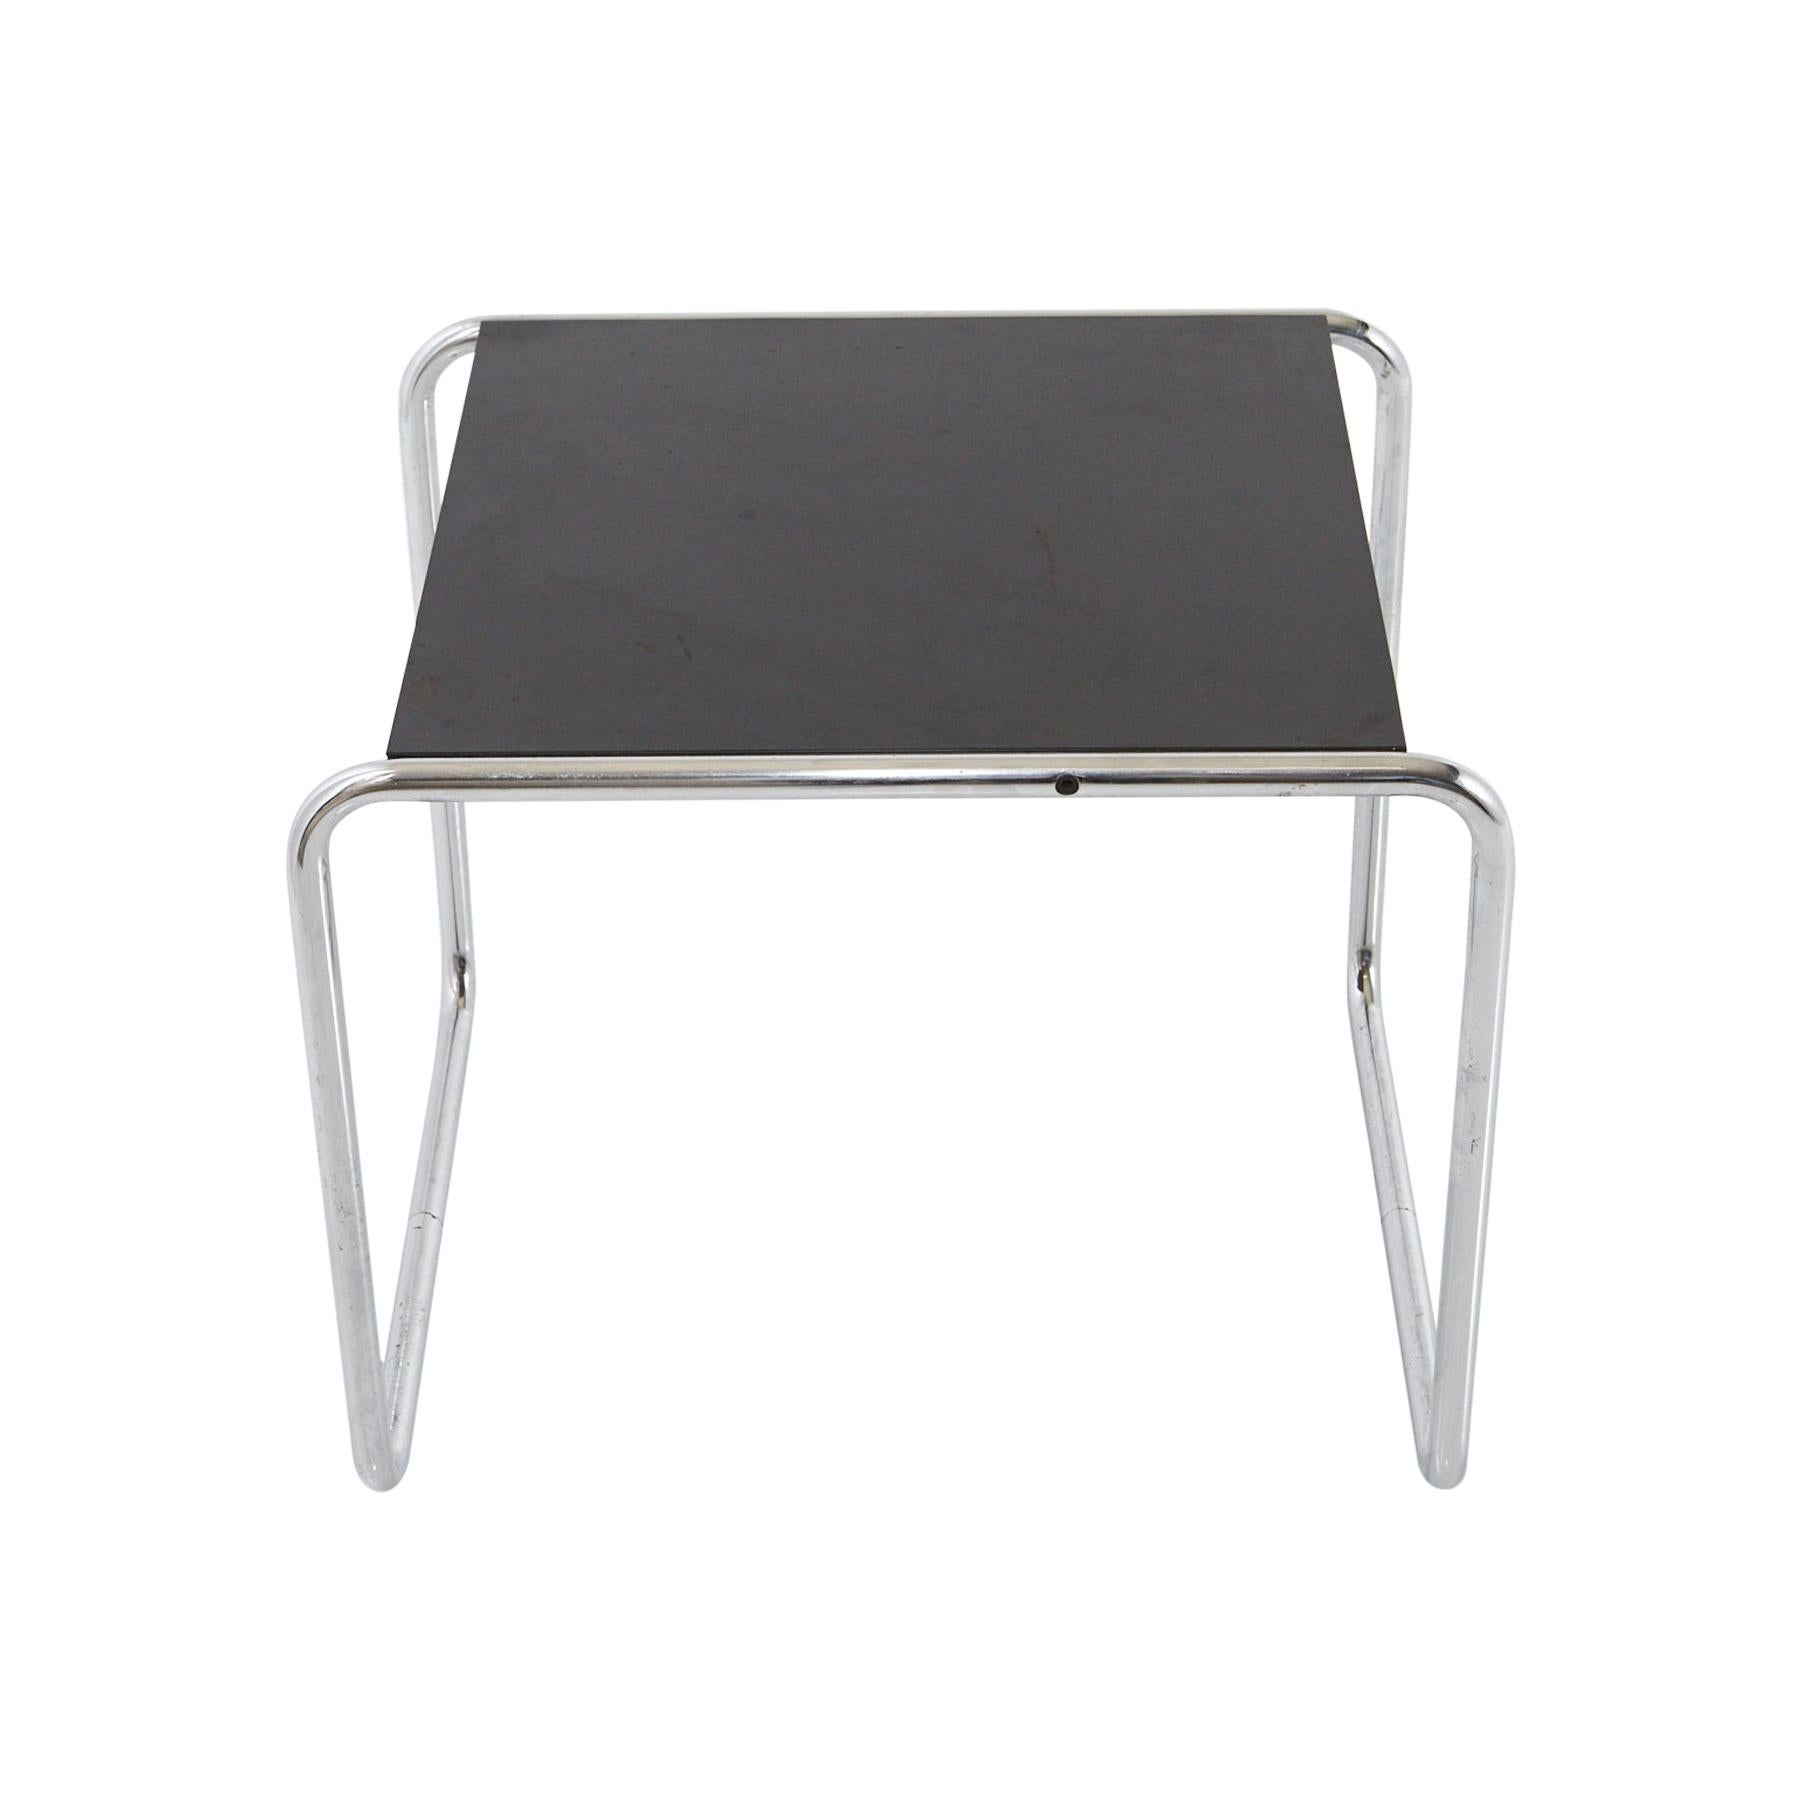 Marcel Breuer - Laccio Side Table Black Laminated Top with Tubular Chromed Base